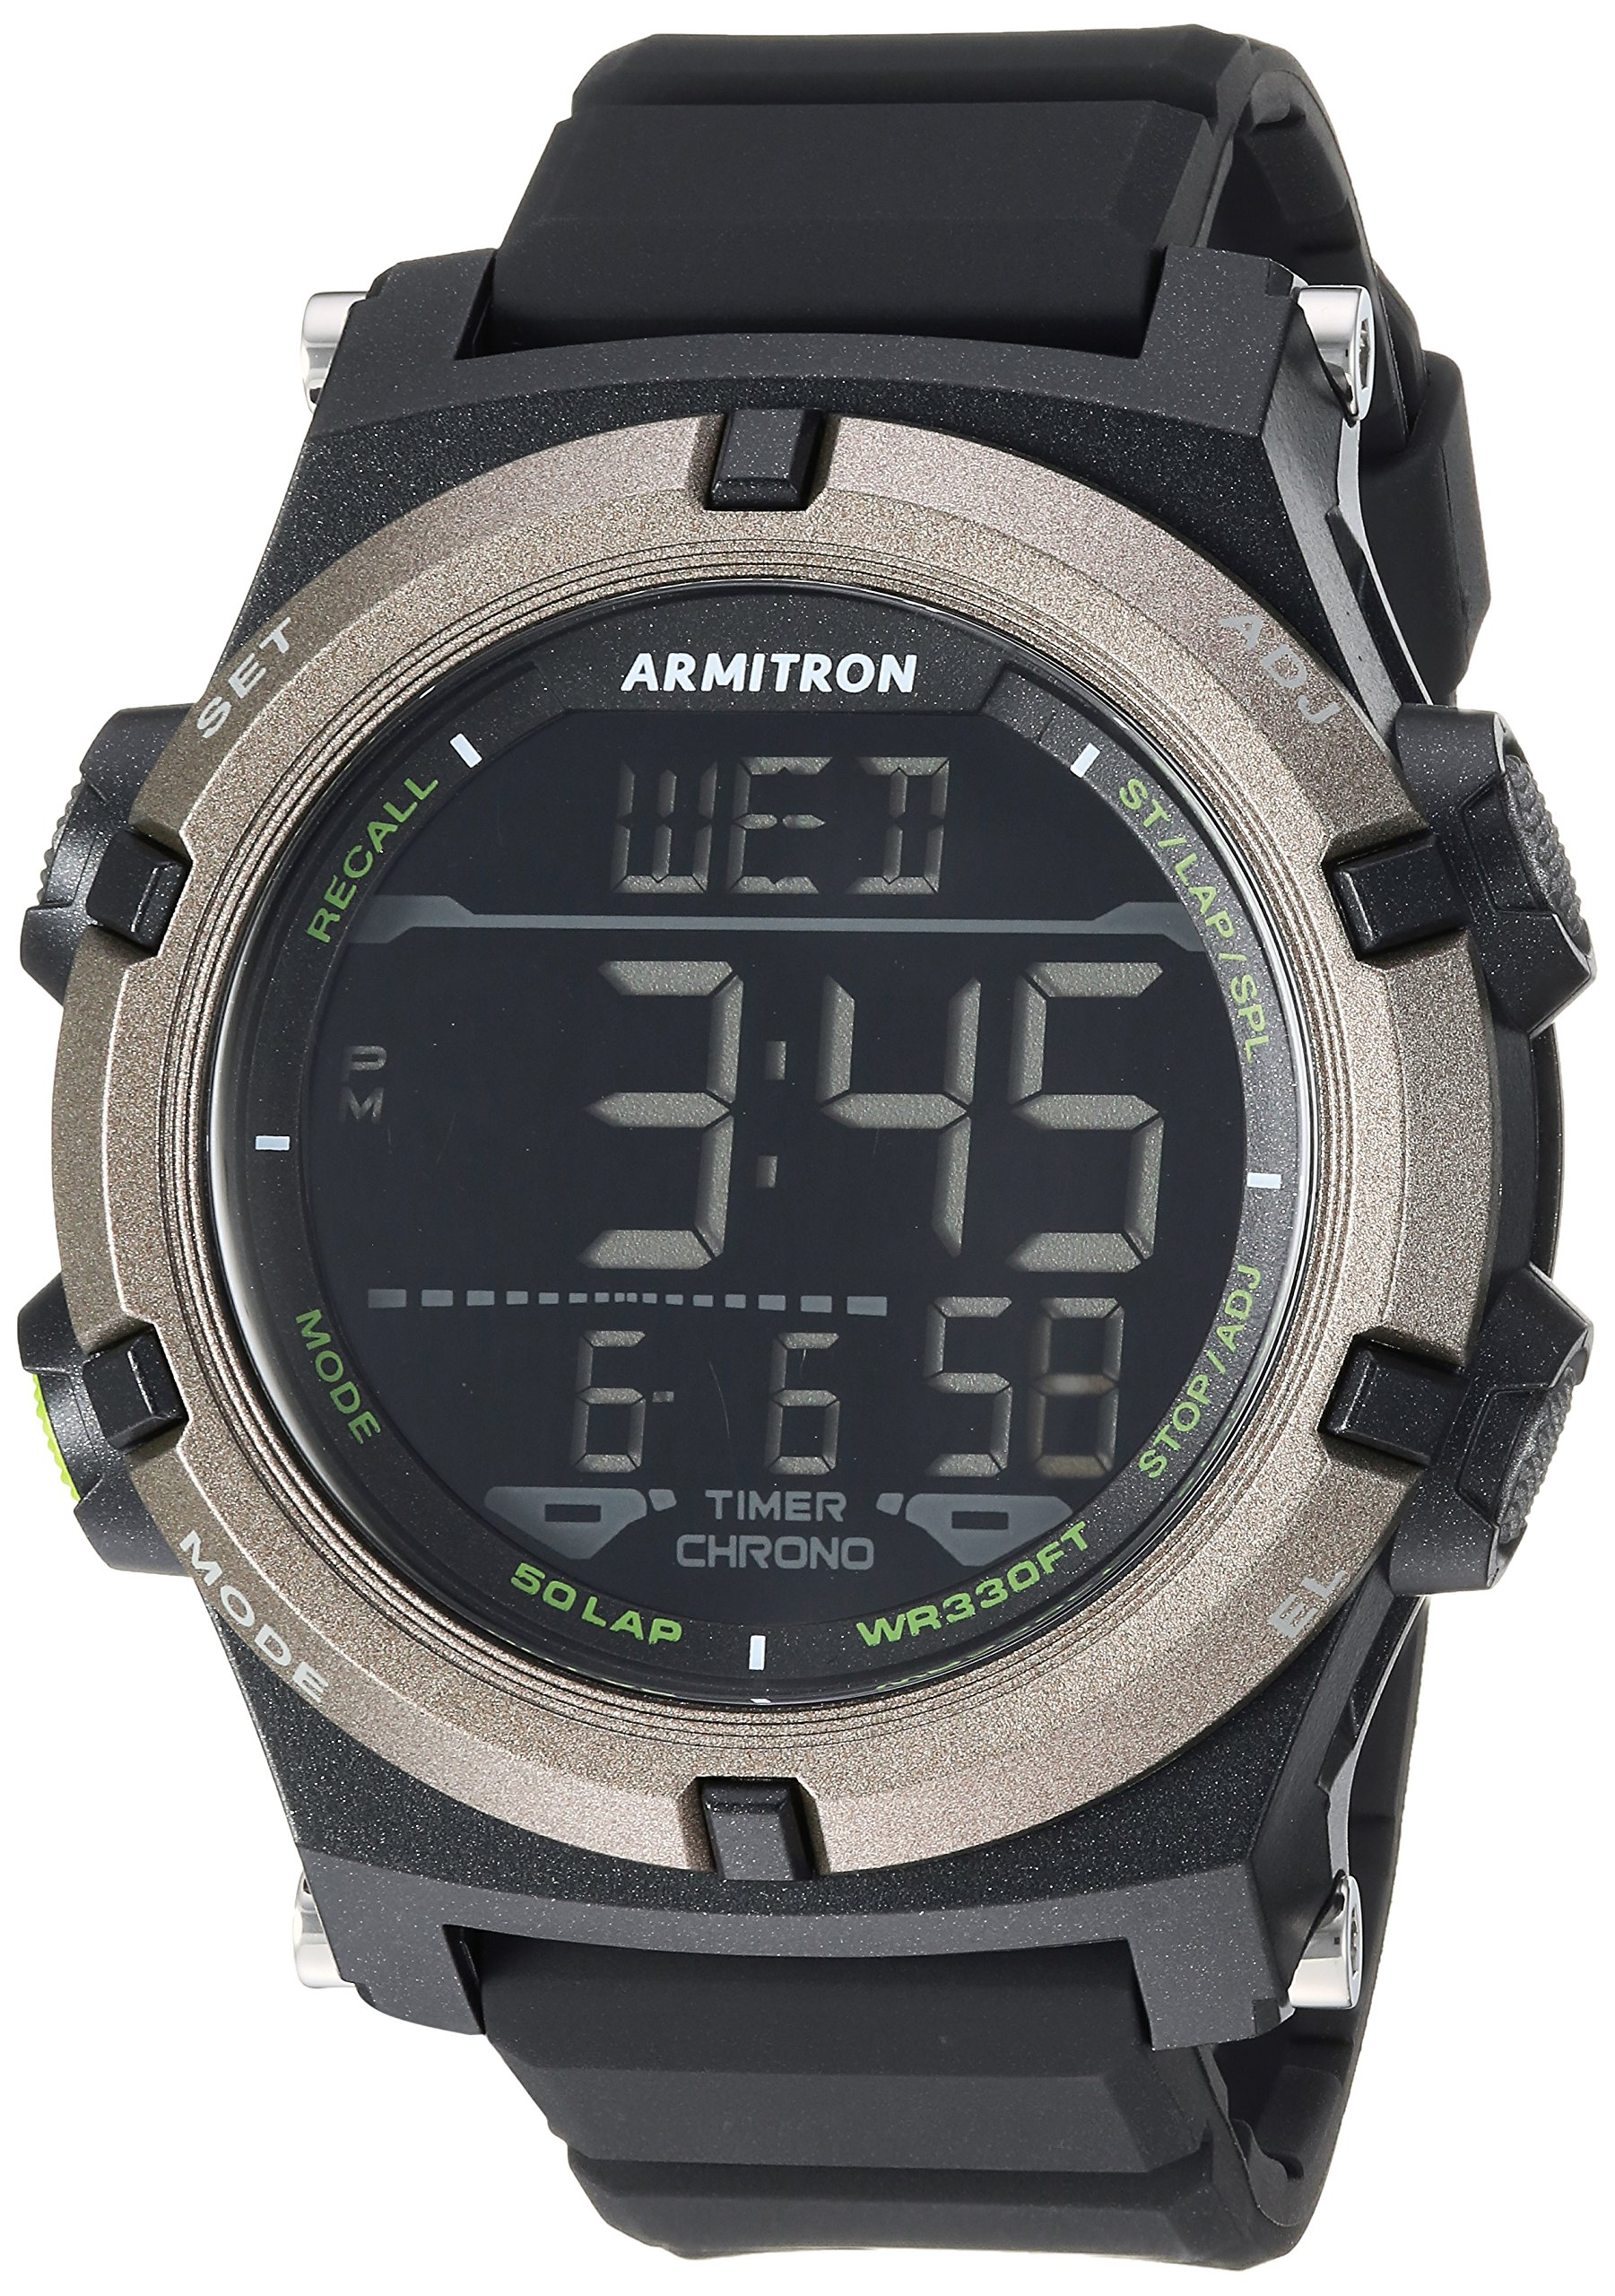 Armitron Sport Men's 40/8438BLK Digital Chronograph Black Resin Strap Watch by Armitron Sport